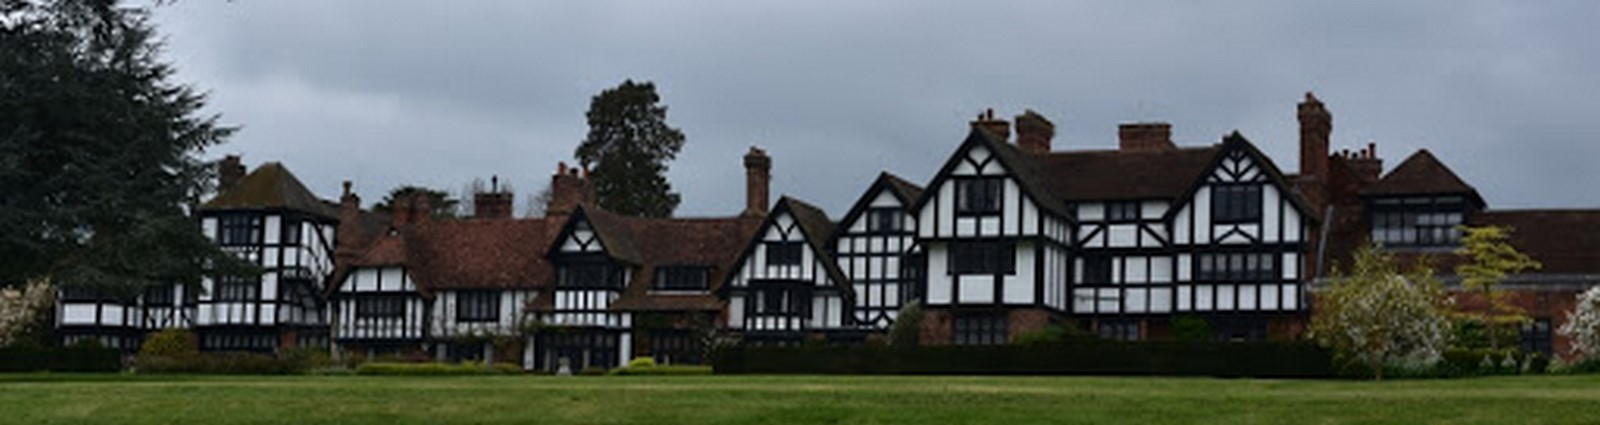 Ascott House, Buckinghamshire, England - Sheet1